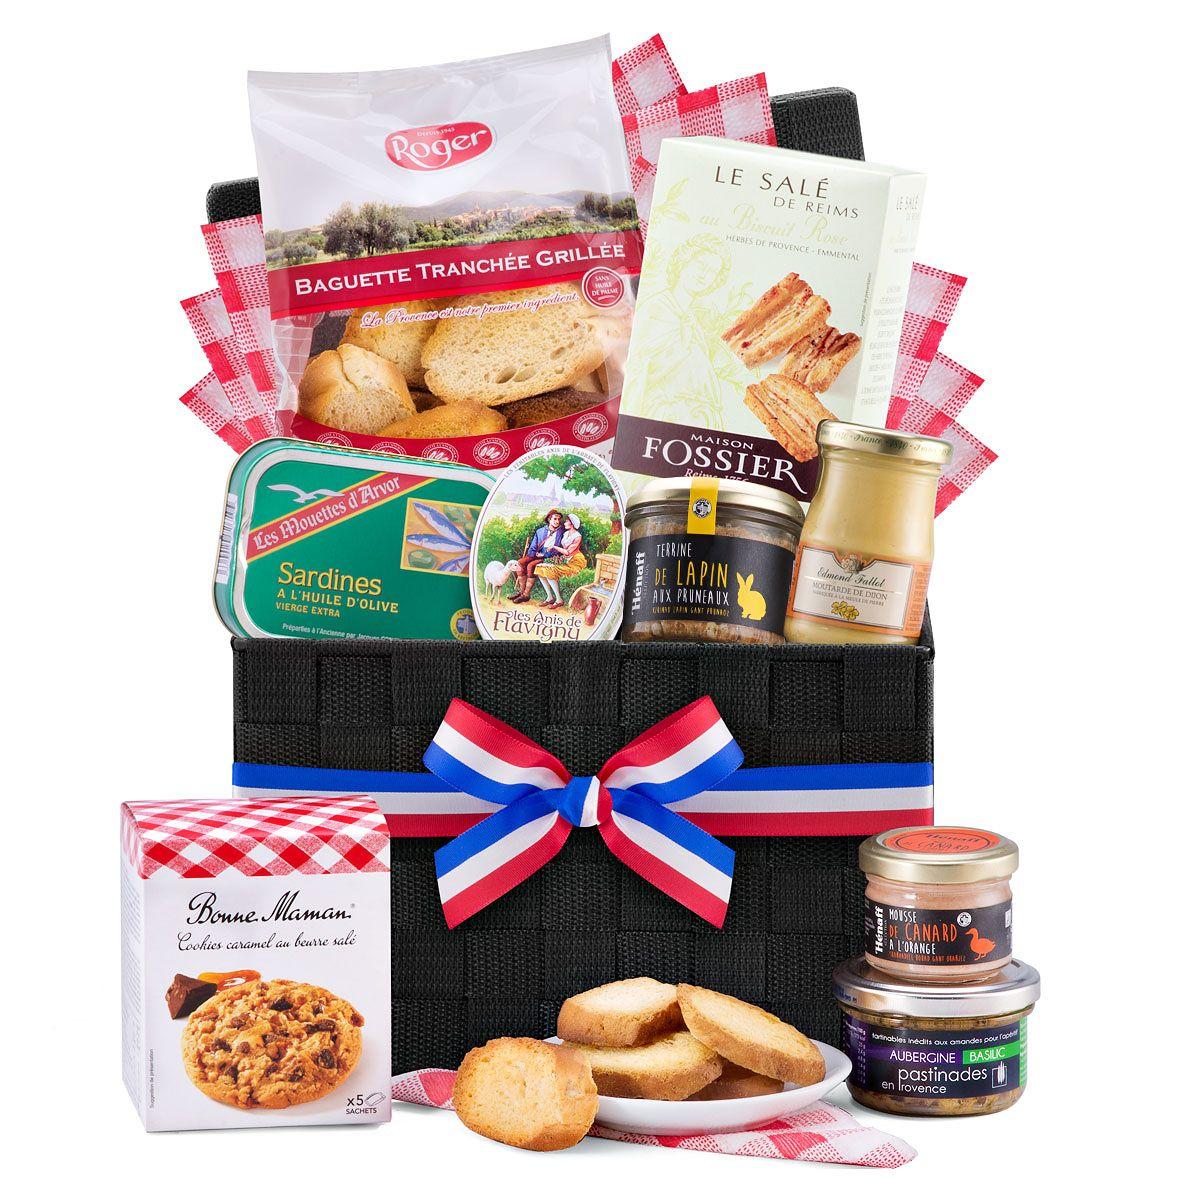 French gourmet gift picnic hamper gourmet gifts gourmet